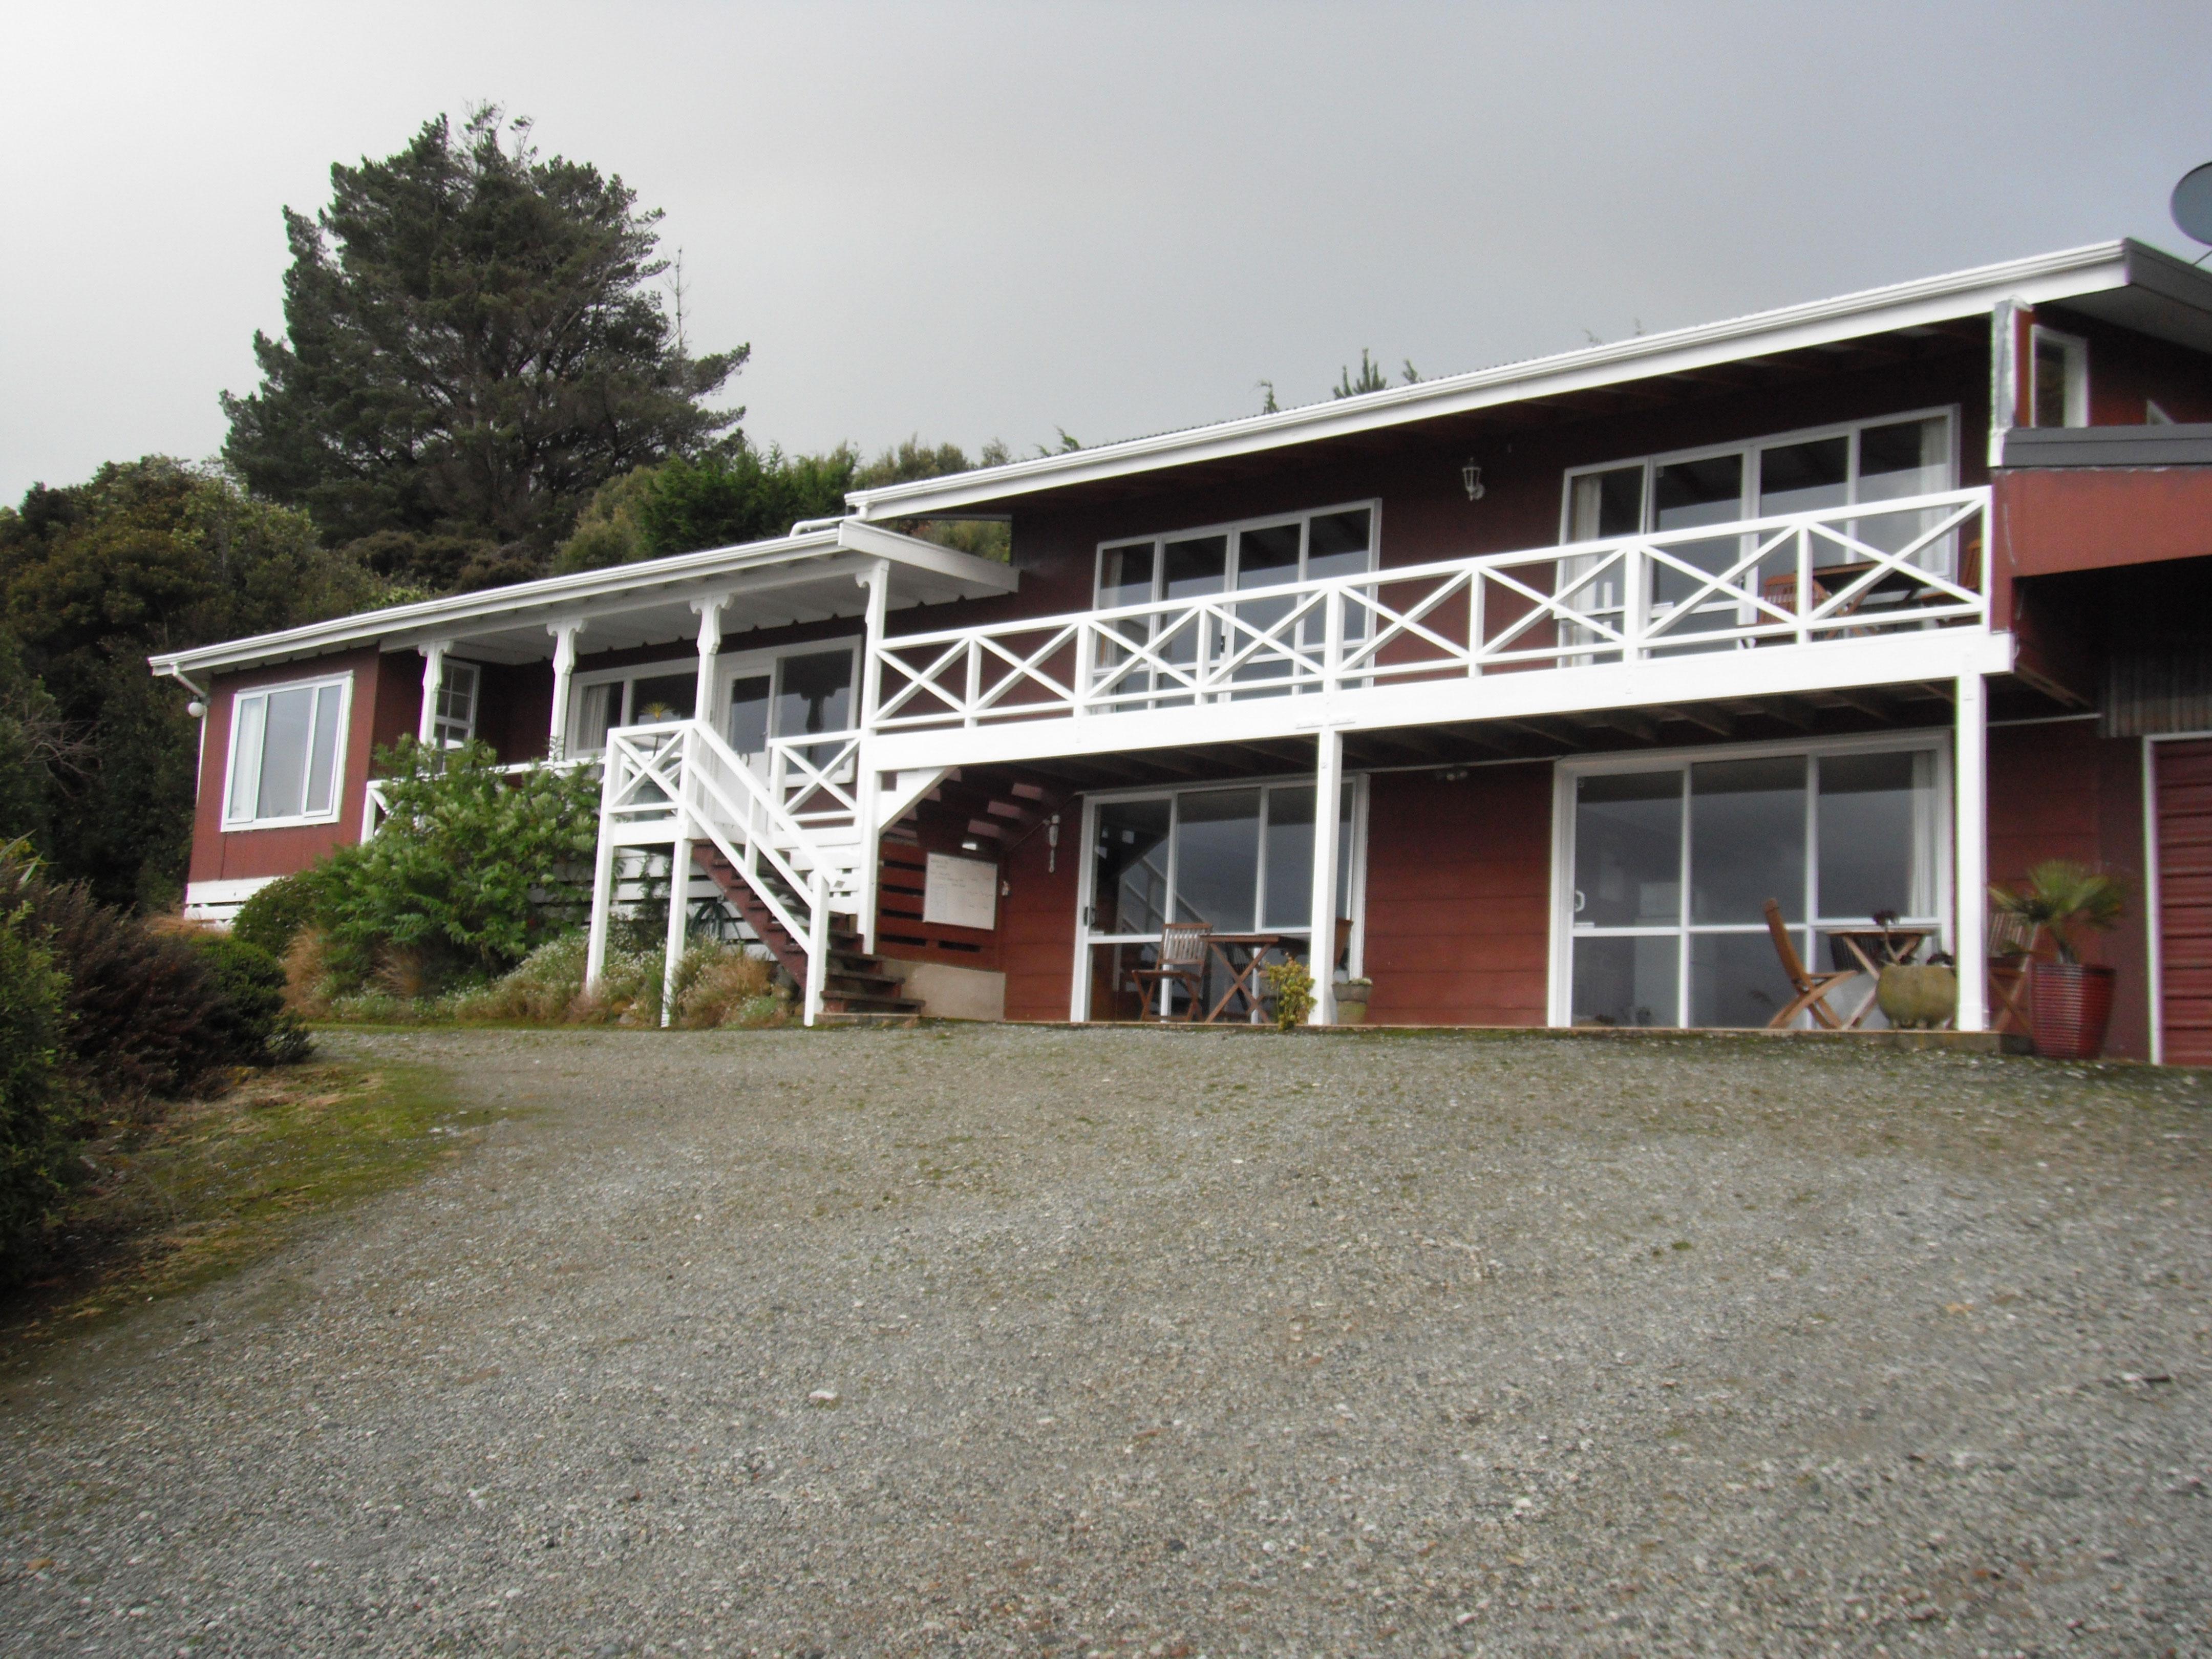 Anchorage Caitlins Waikawa